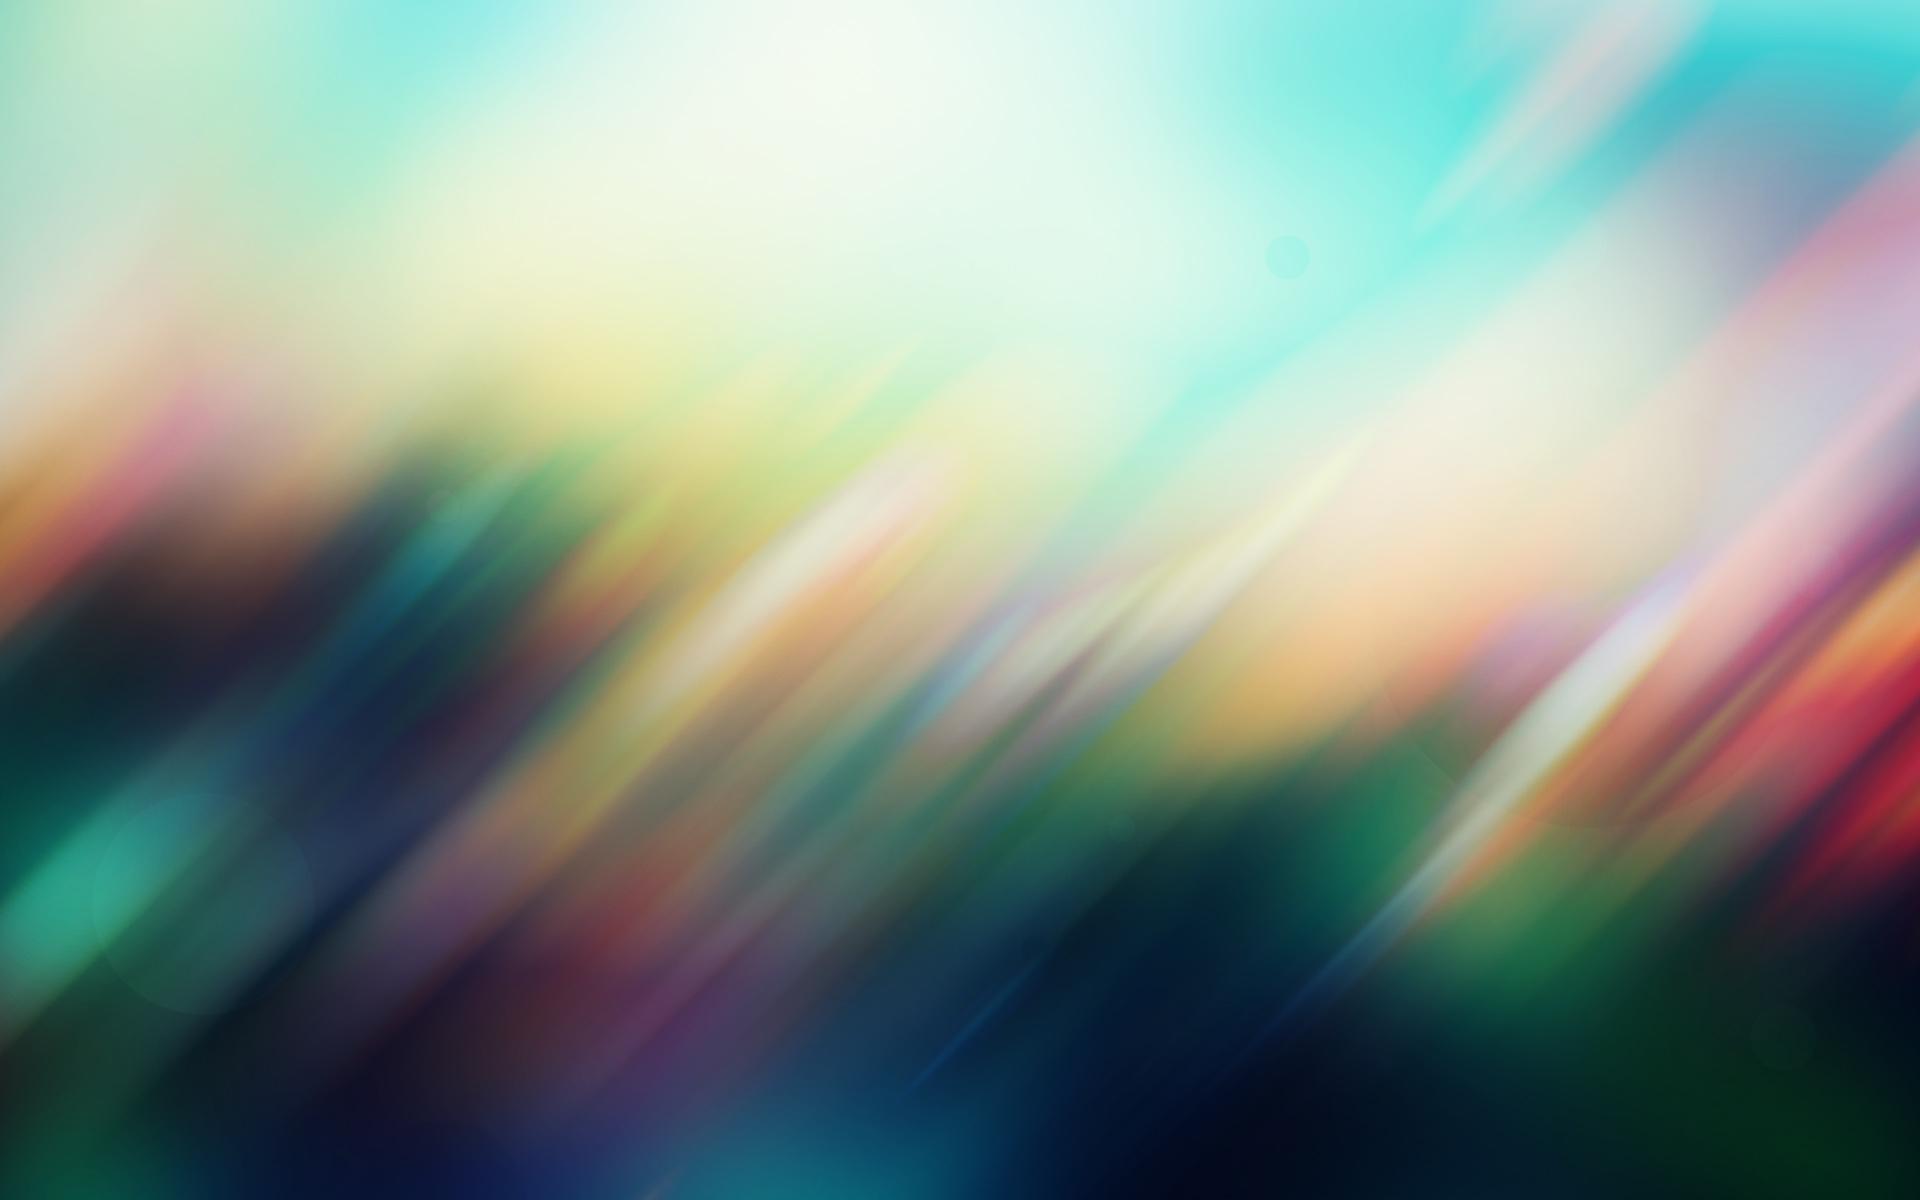 Blur-HD-Backgrounds-wallpaper-wpc5802941